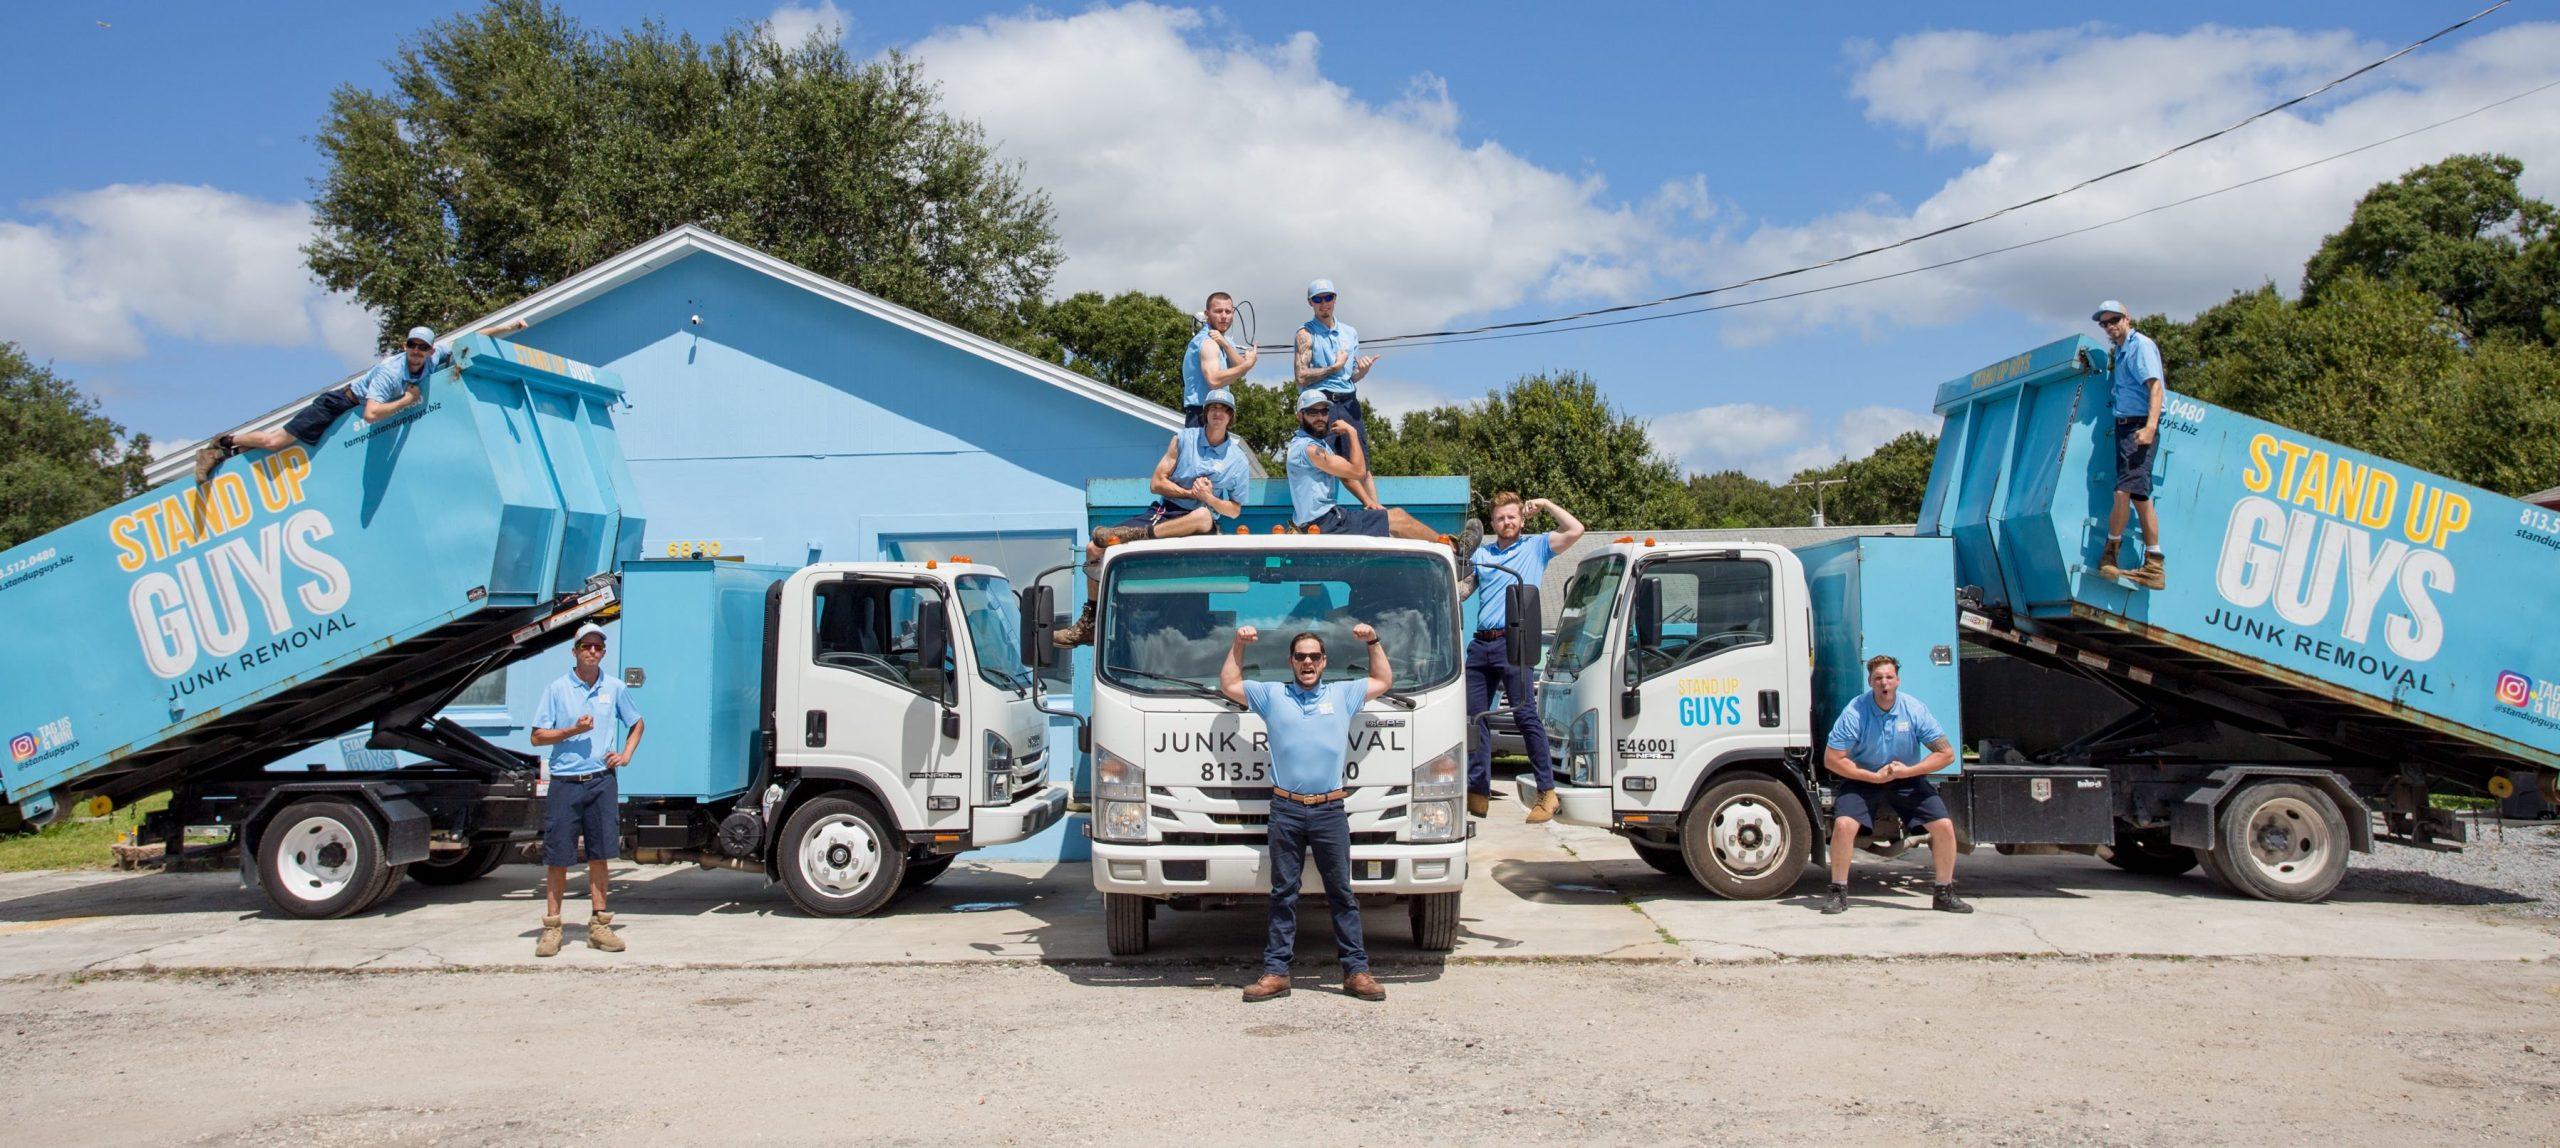 Winter Park junk removal company